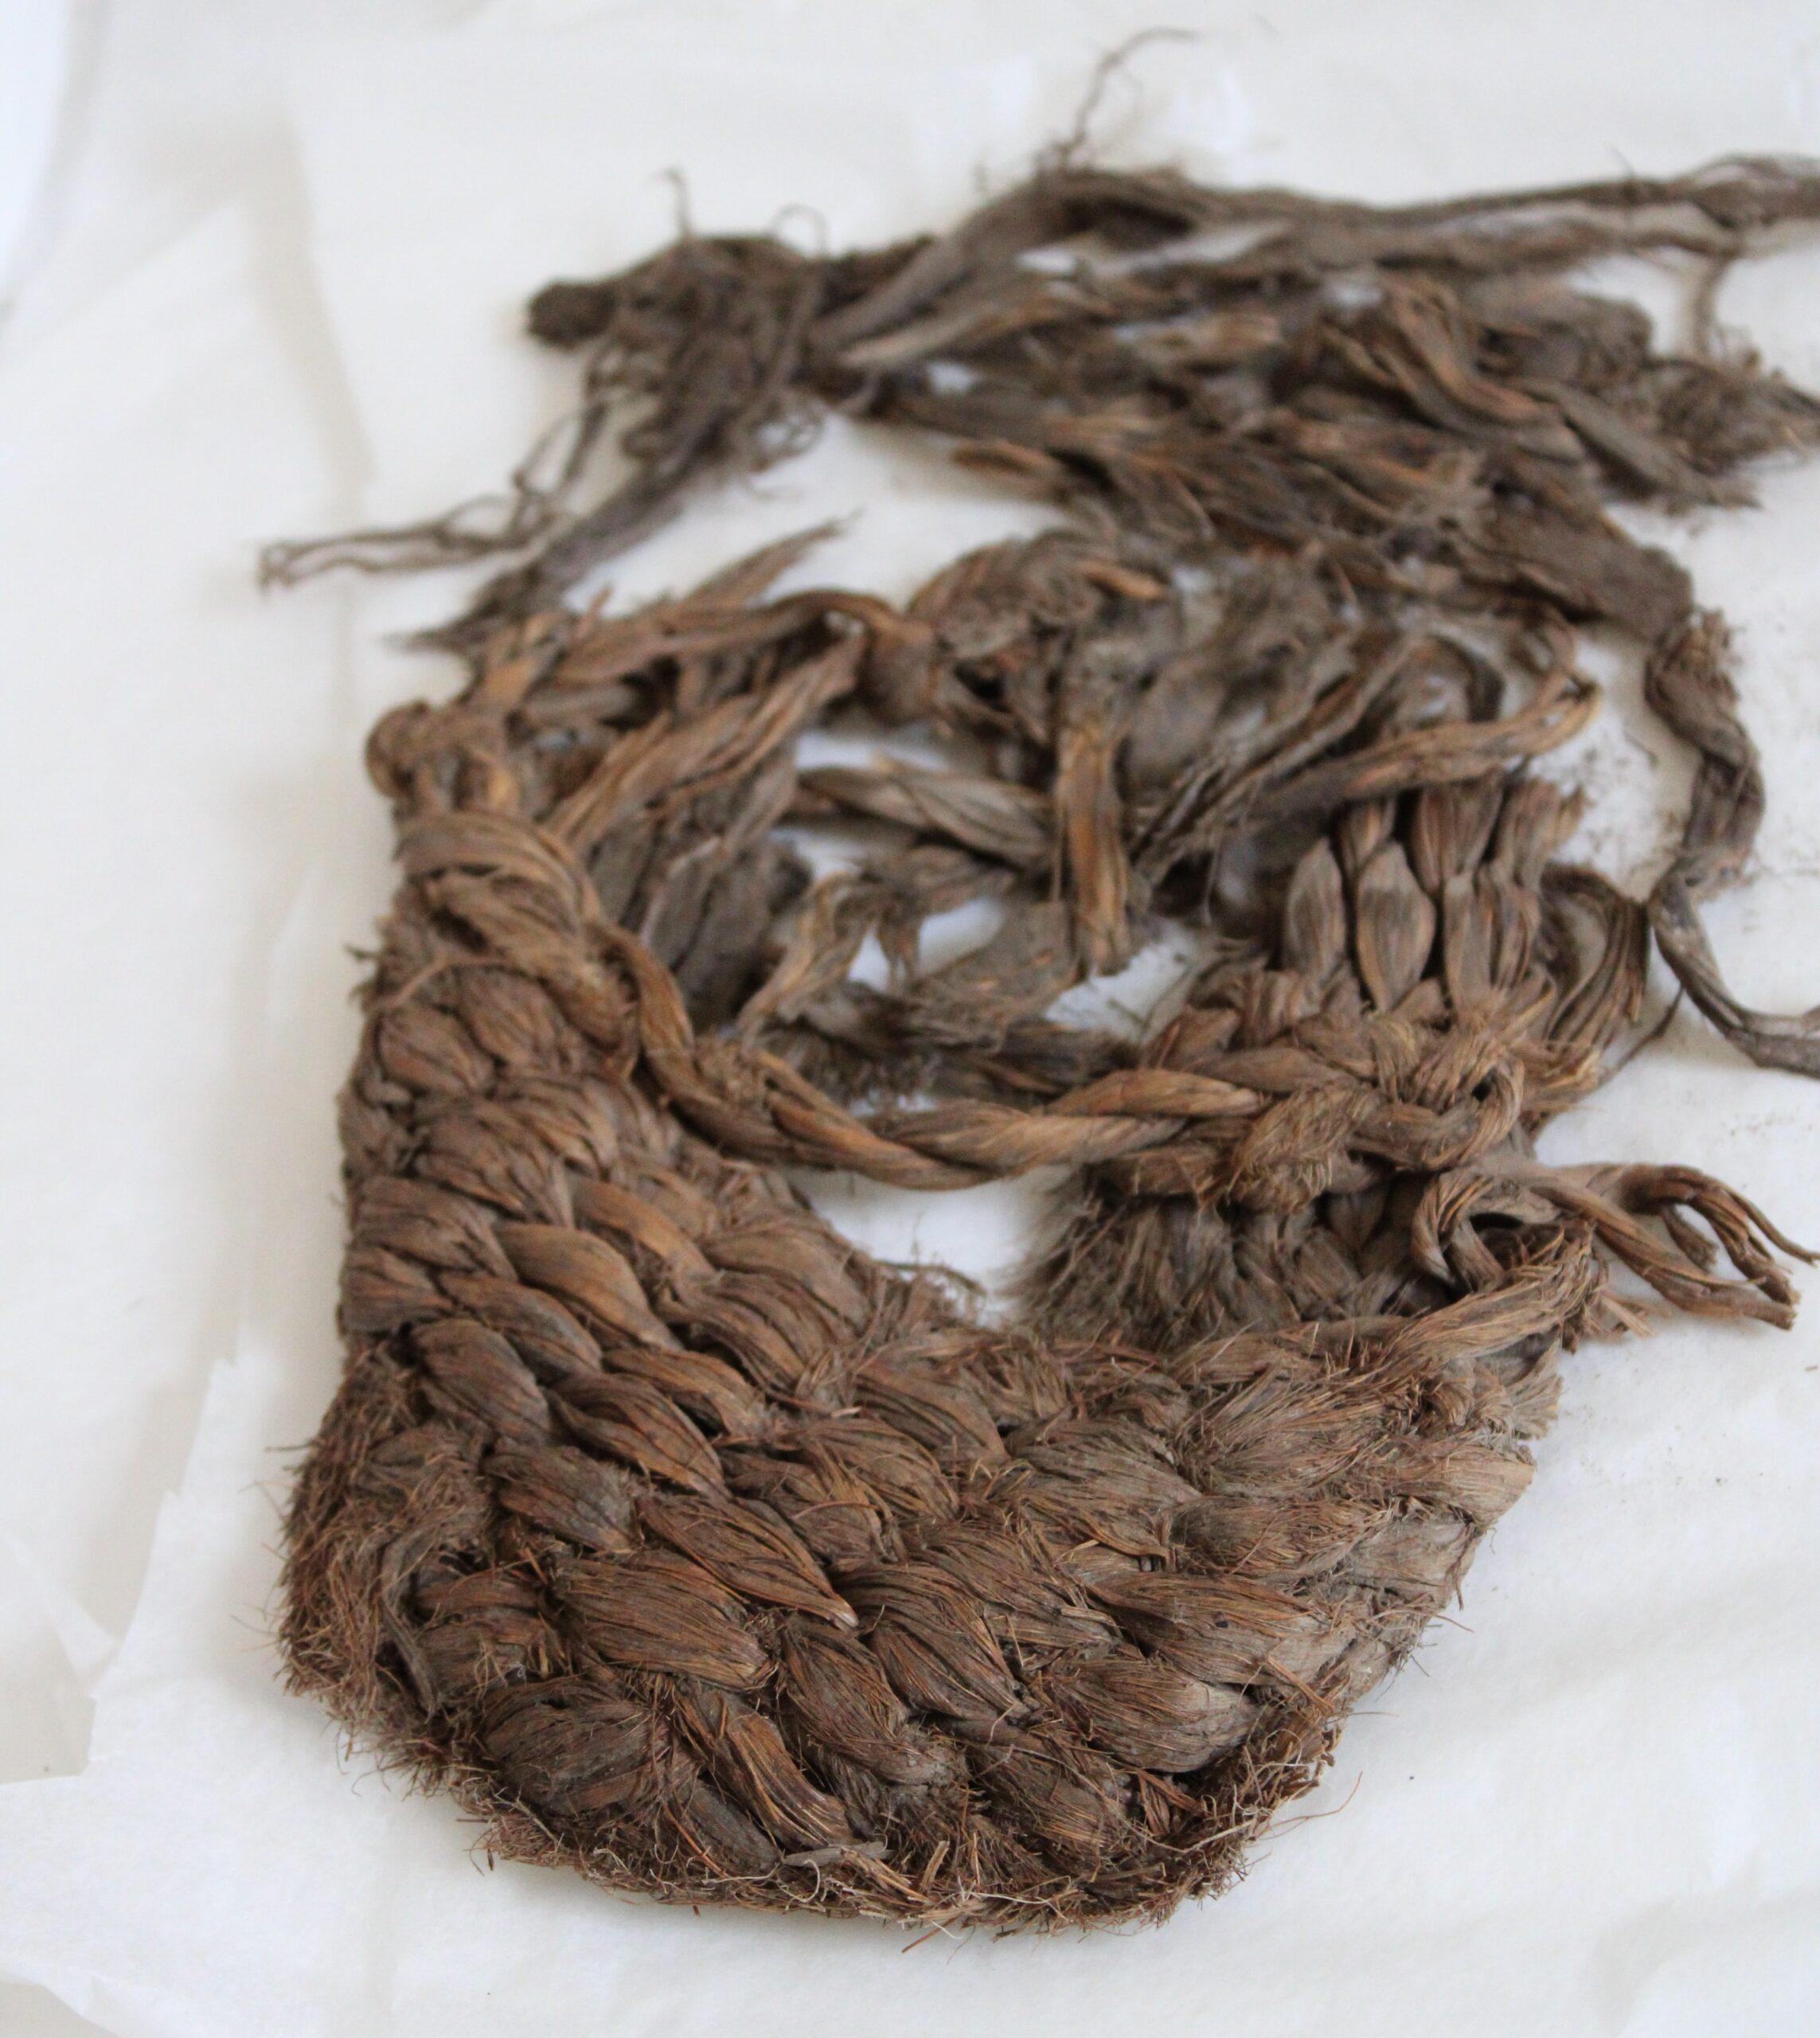 Archeology Training Artifact